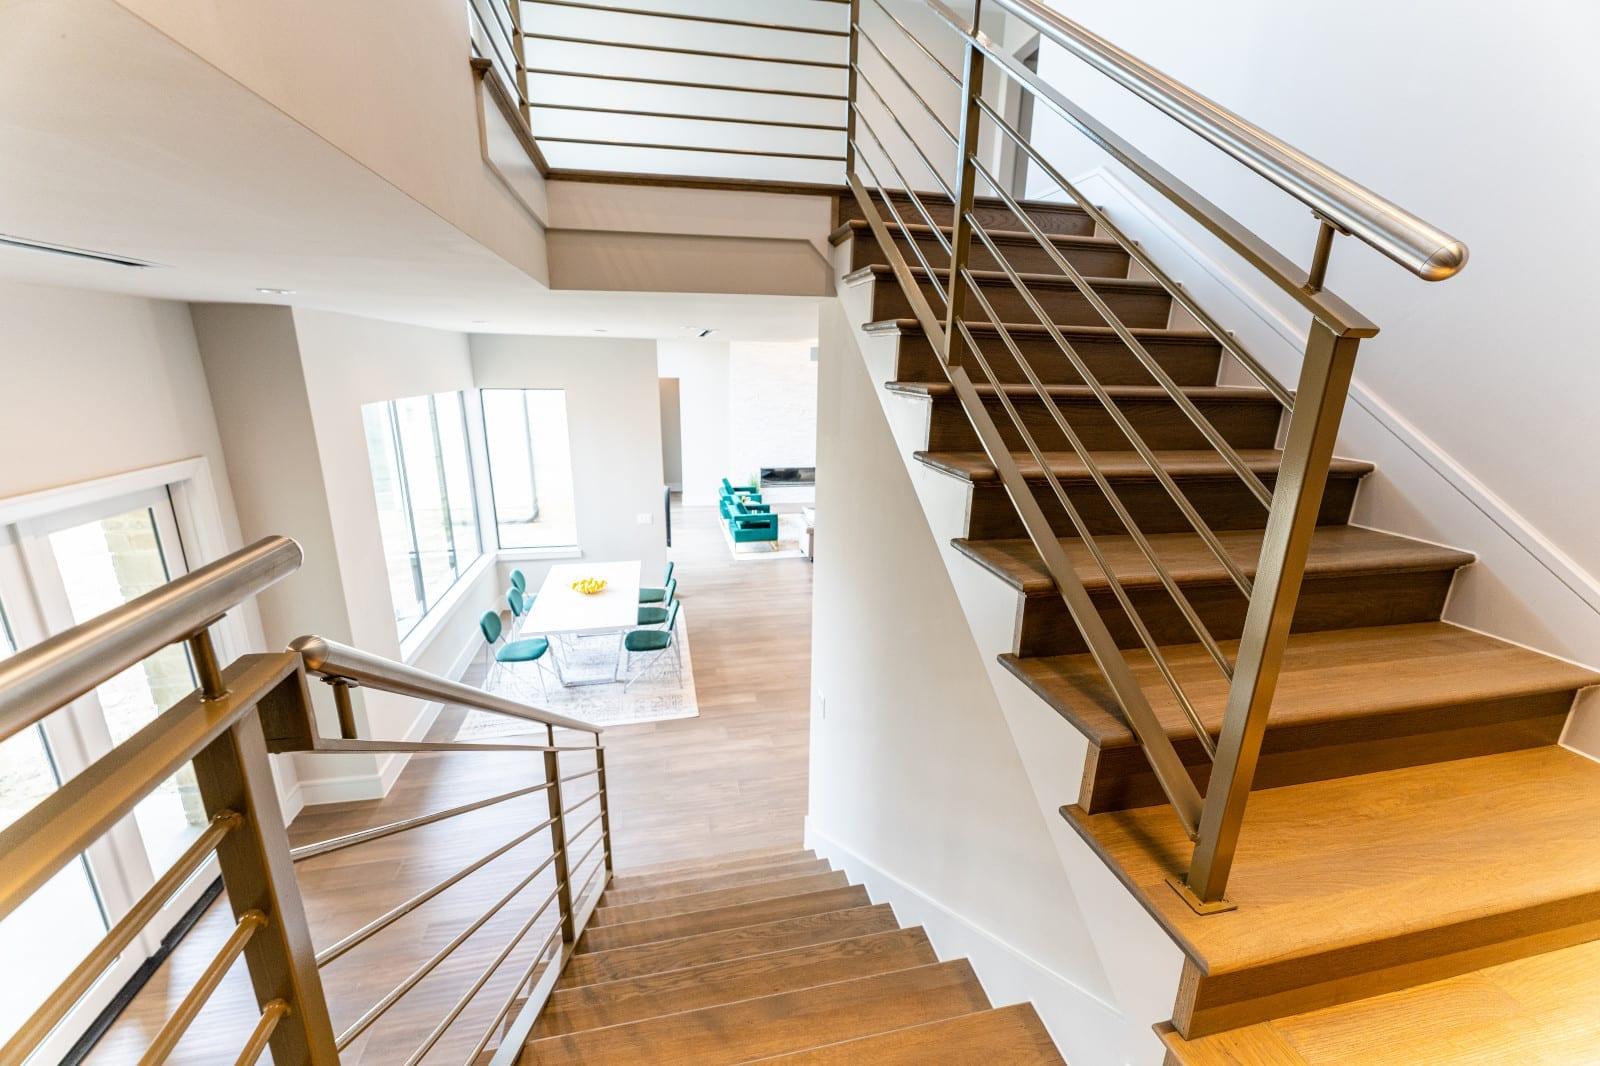 Modern Style Homes design # 29 - Millennial Design + Build